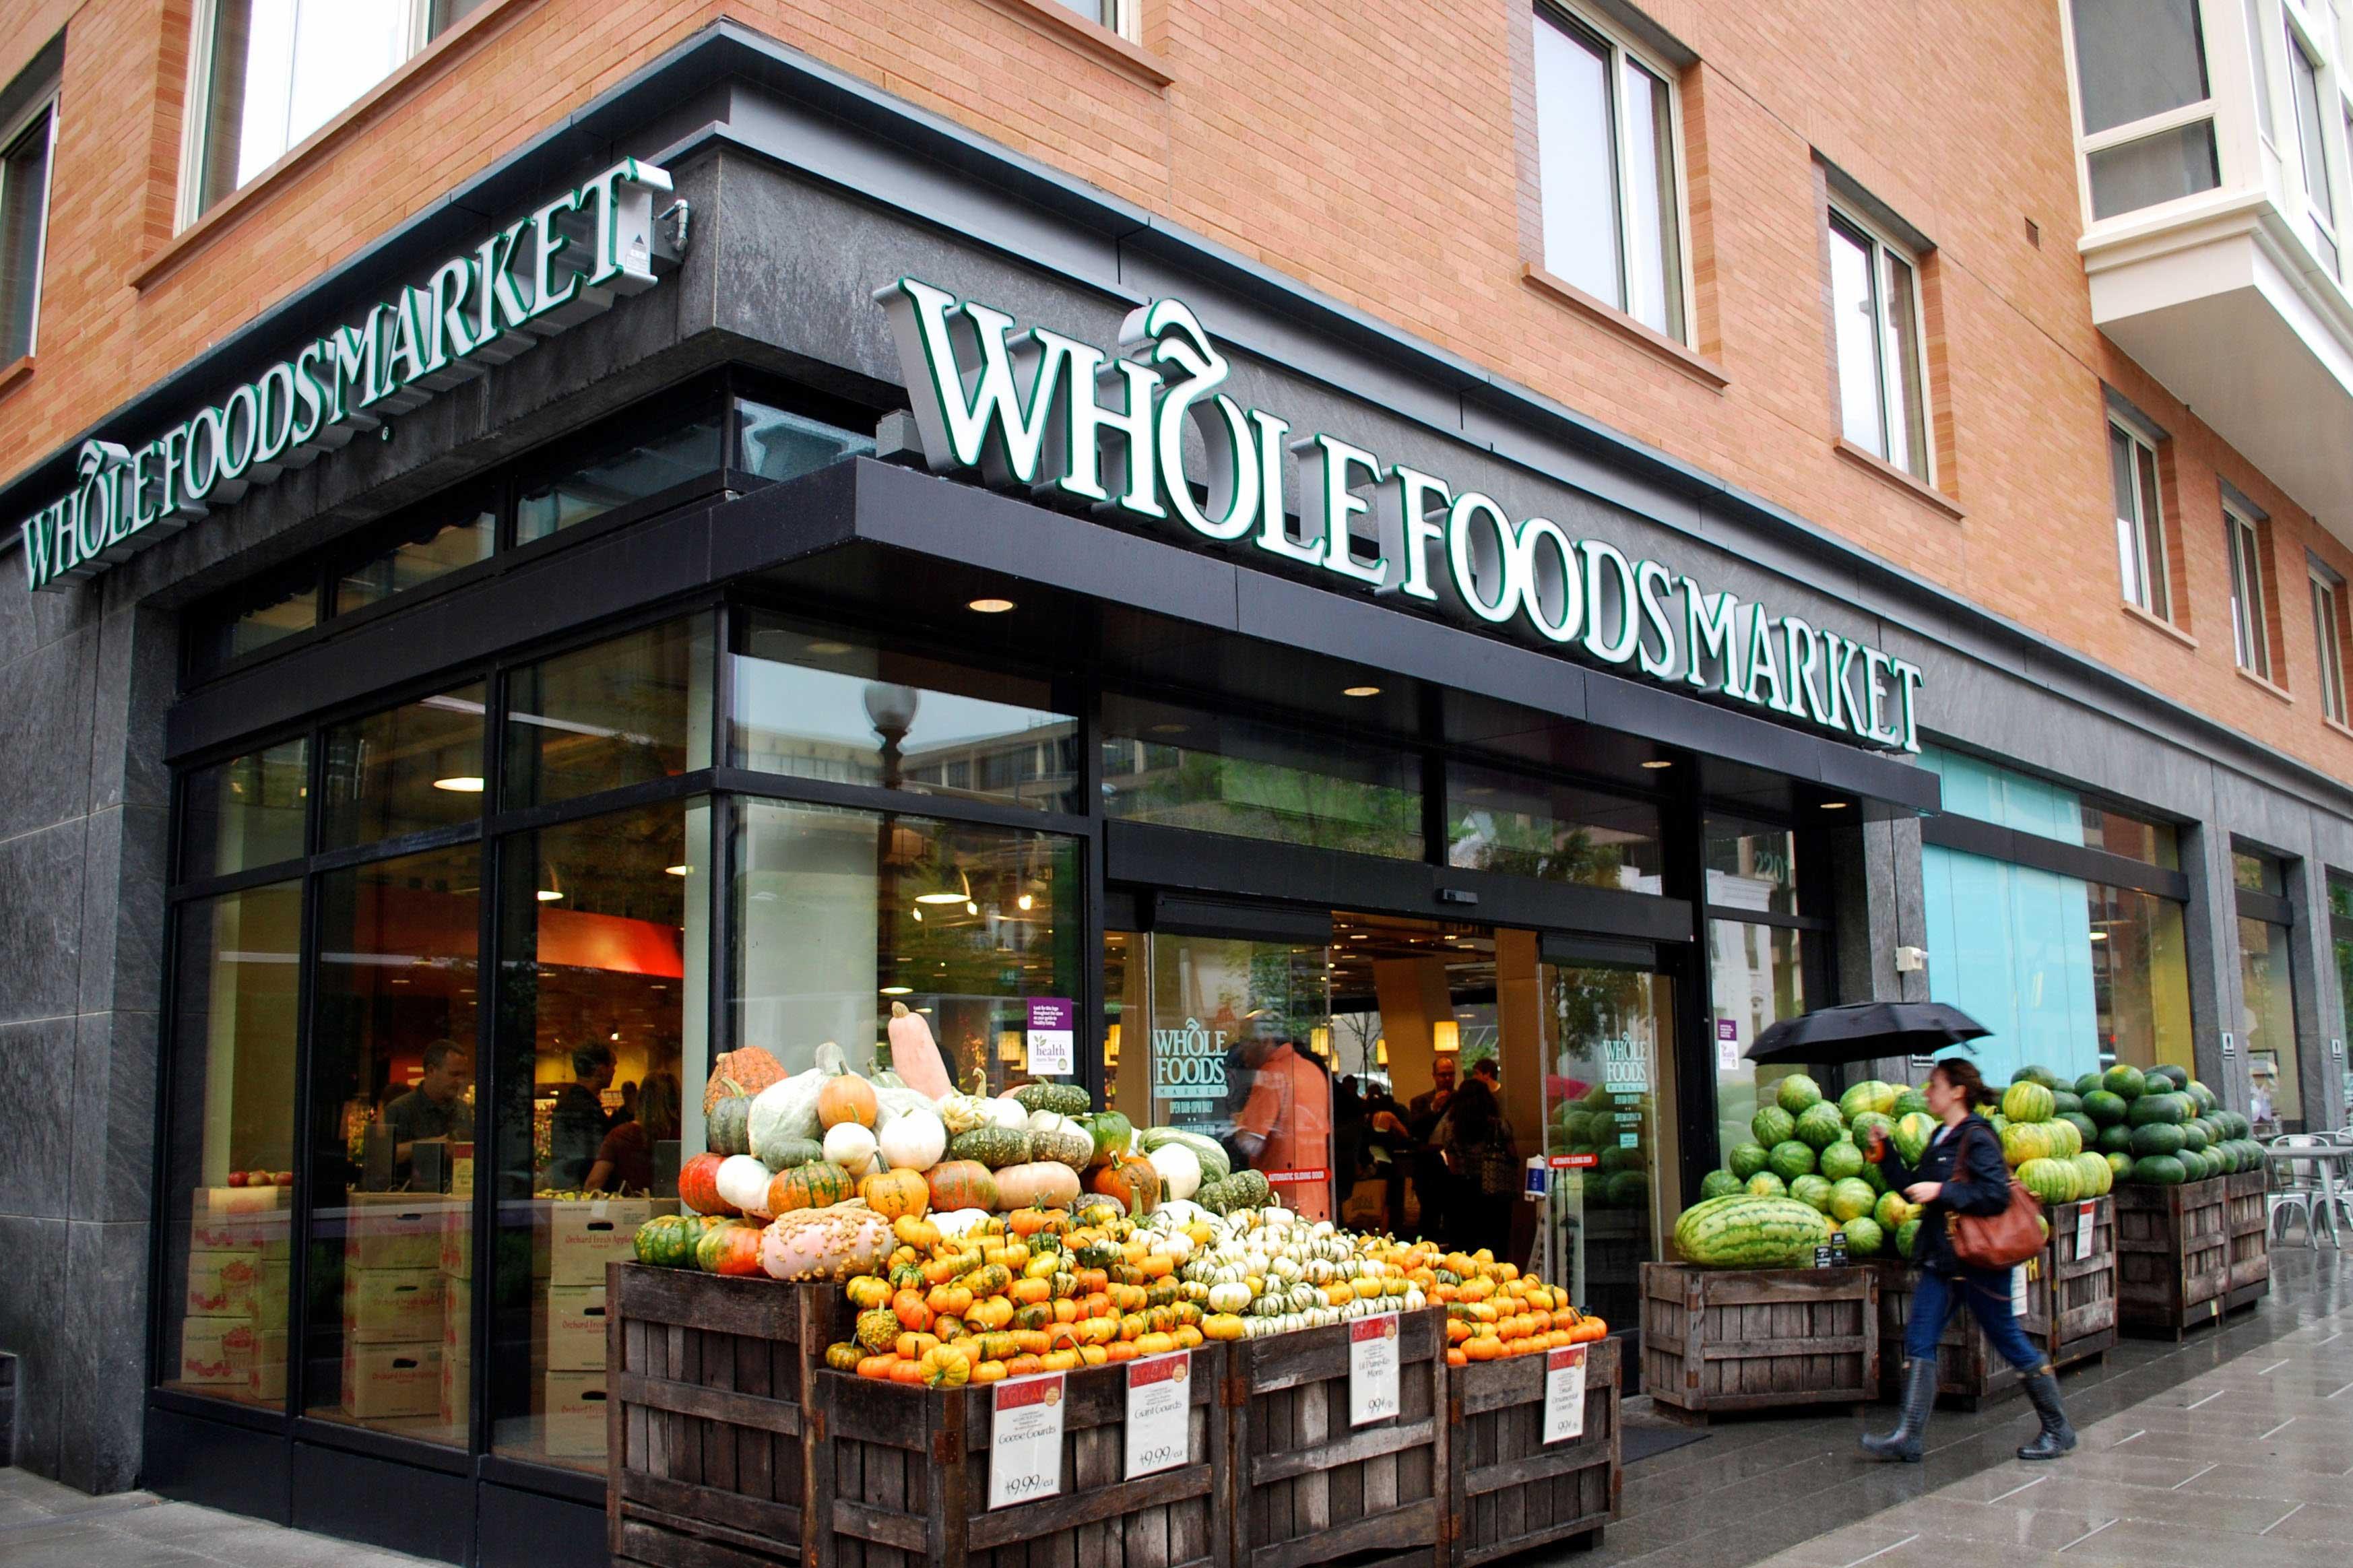 Mackey Ceo Whole Foods